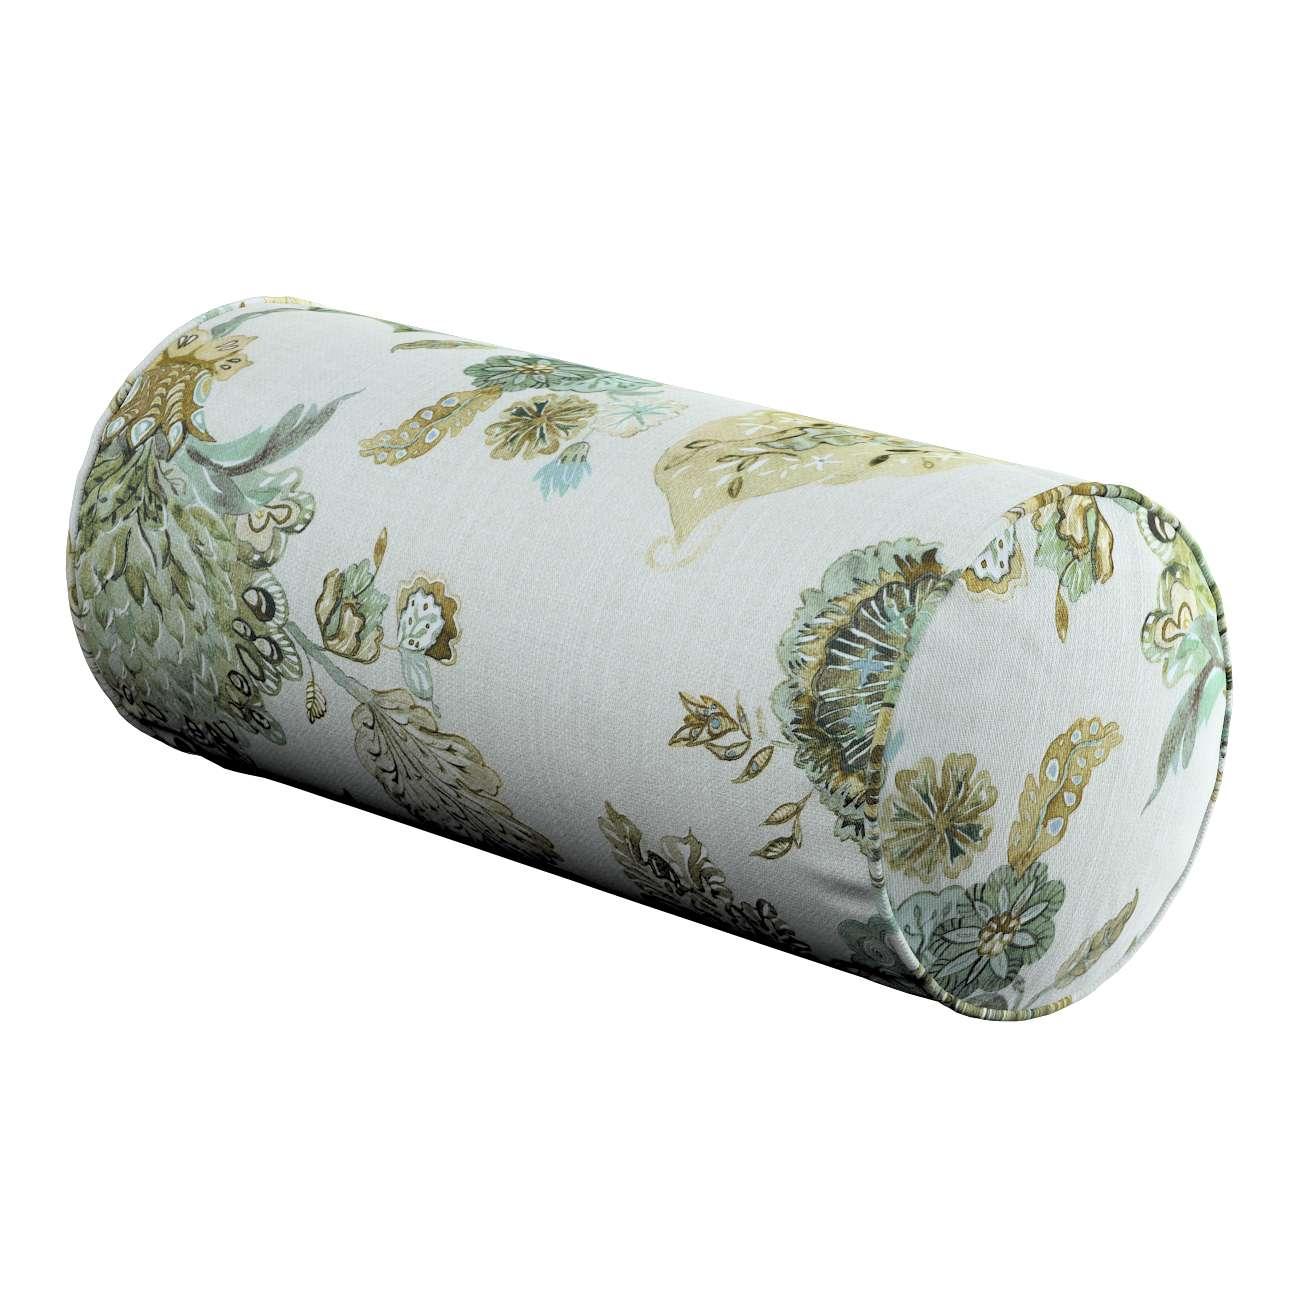 Valček jednoduchý V kolekcii Flowers, tkanina: 143-67